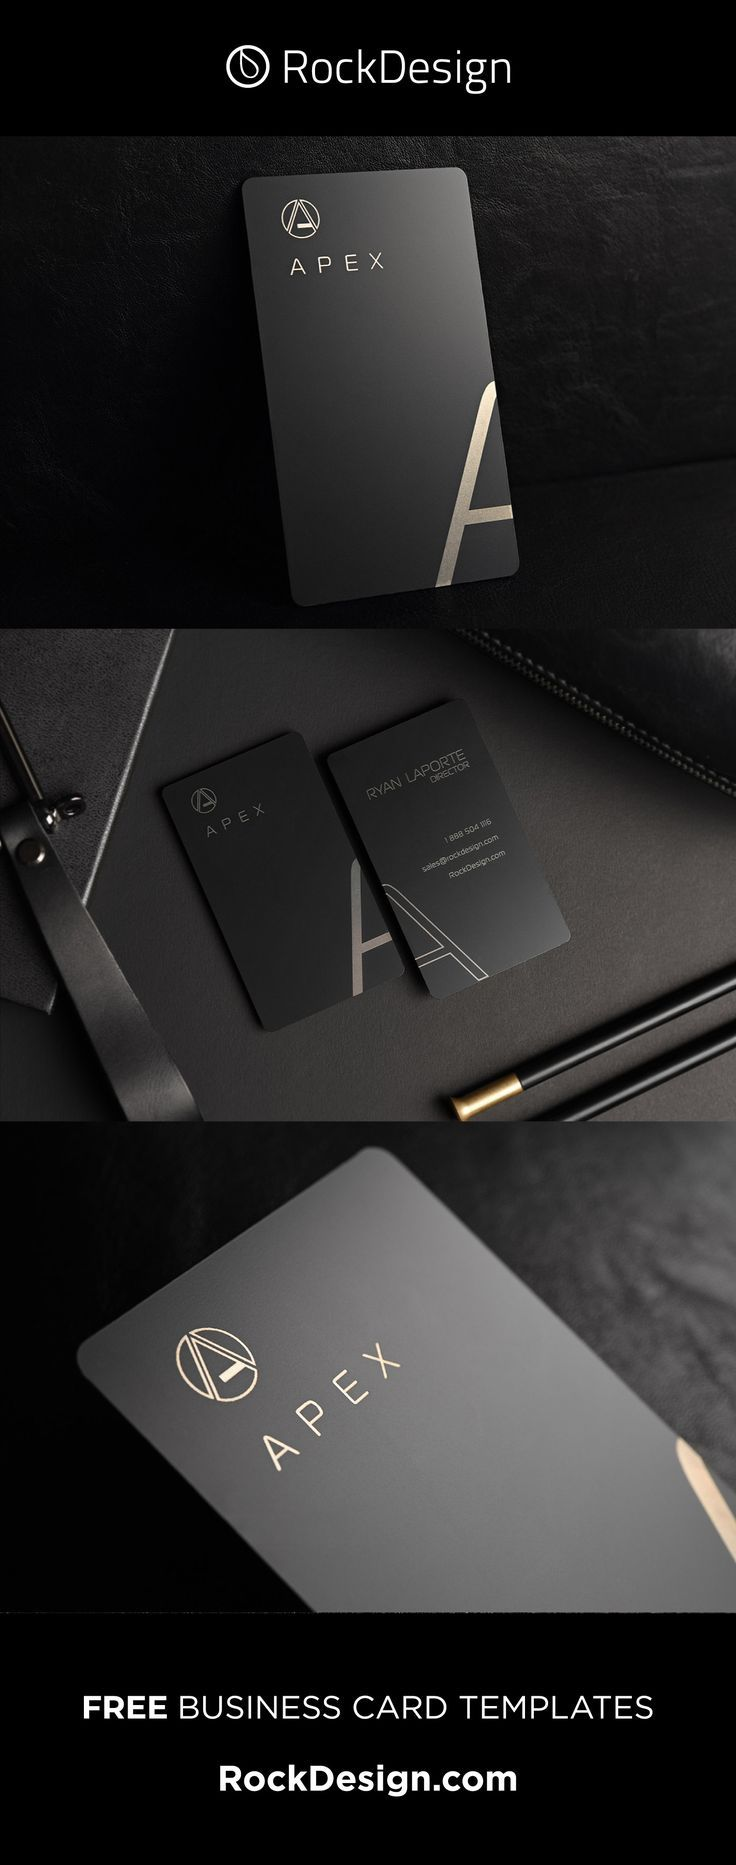 Our Apex Template Is The Peak Of Elegance This Card Is Printed Using Laser En Metal Business Cards Elegant Business Cards Design Business Card Design Creative